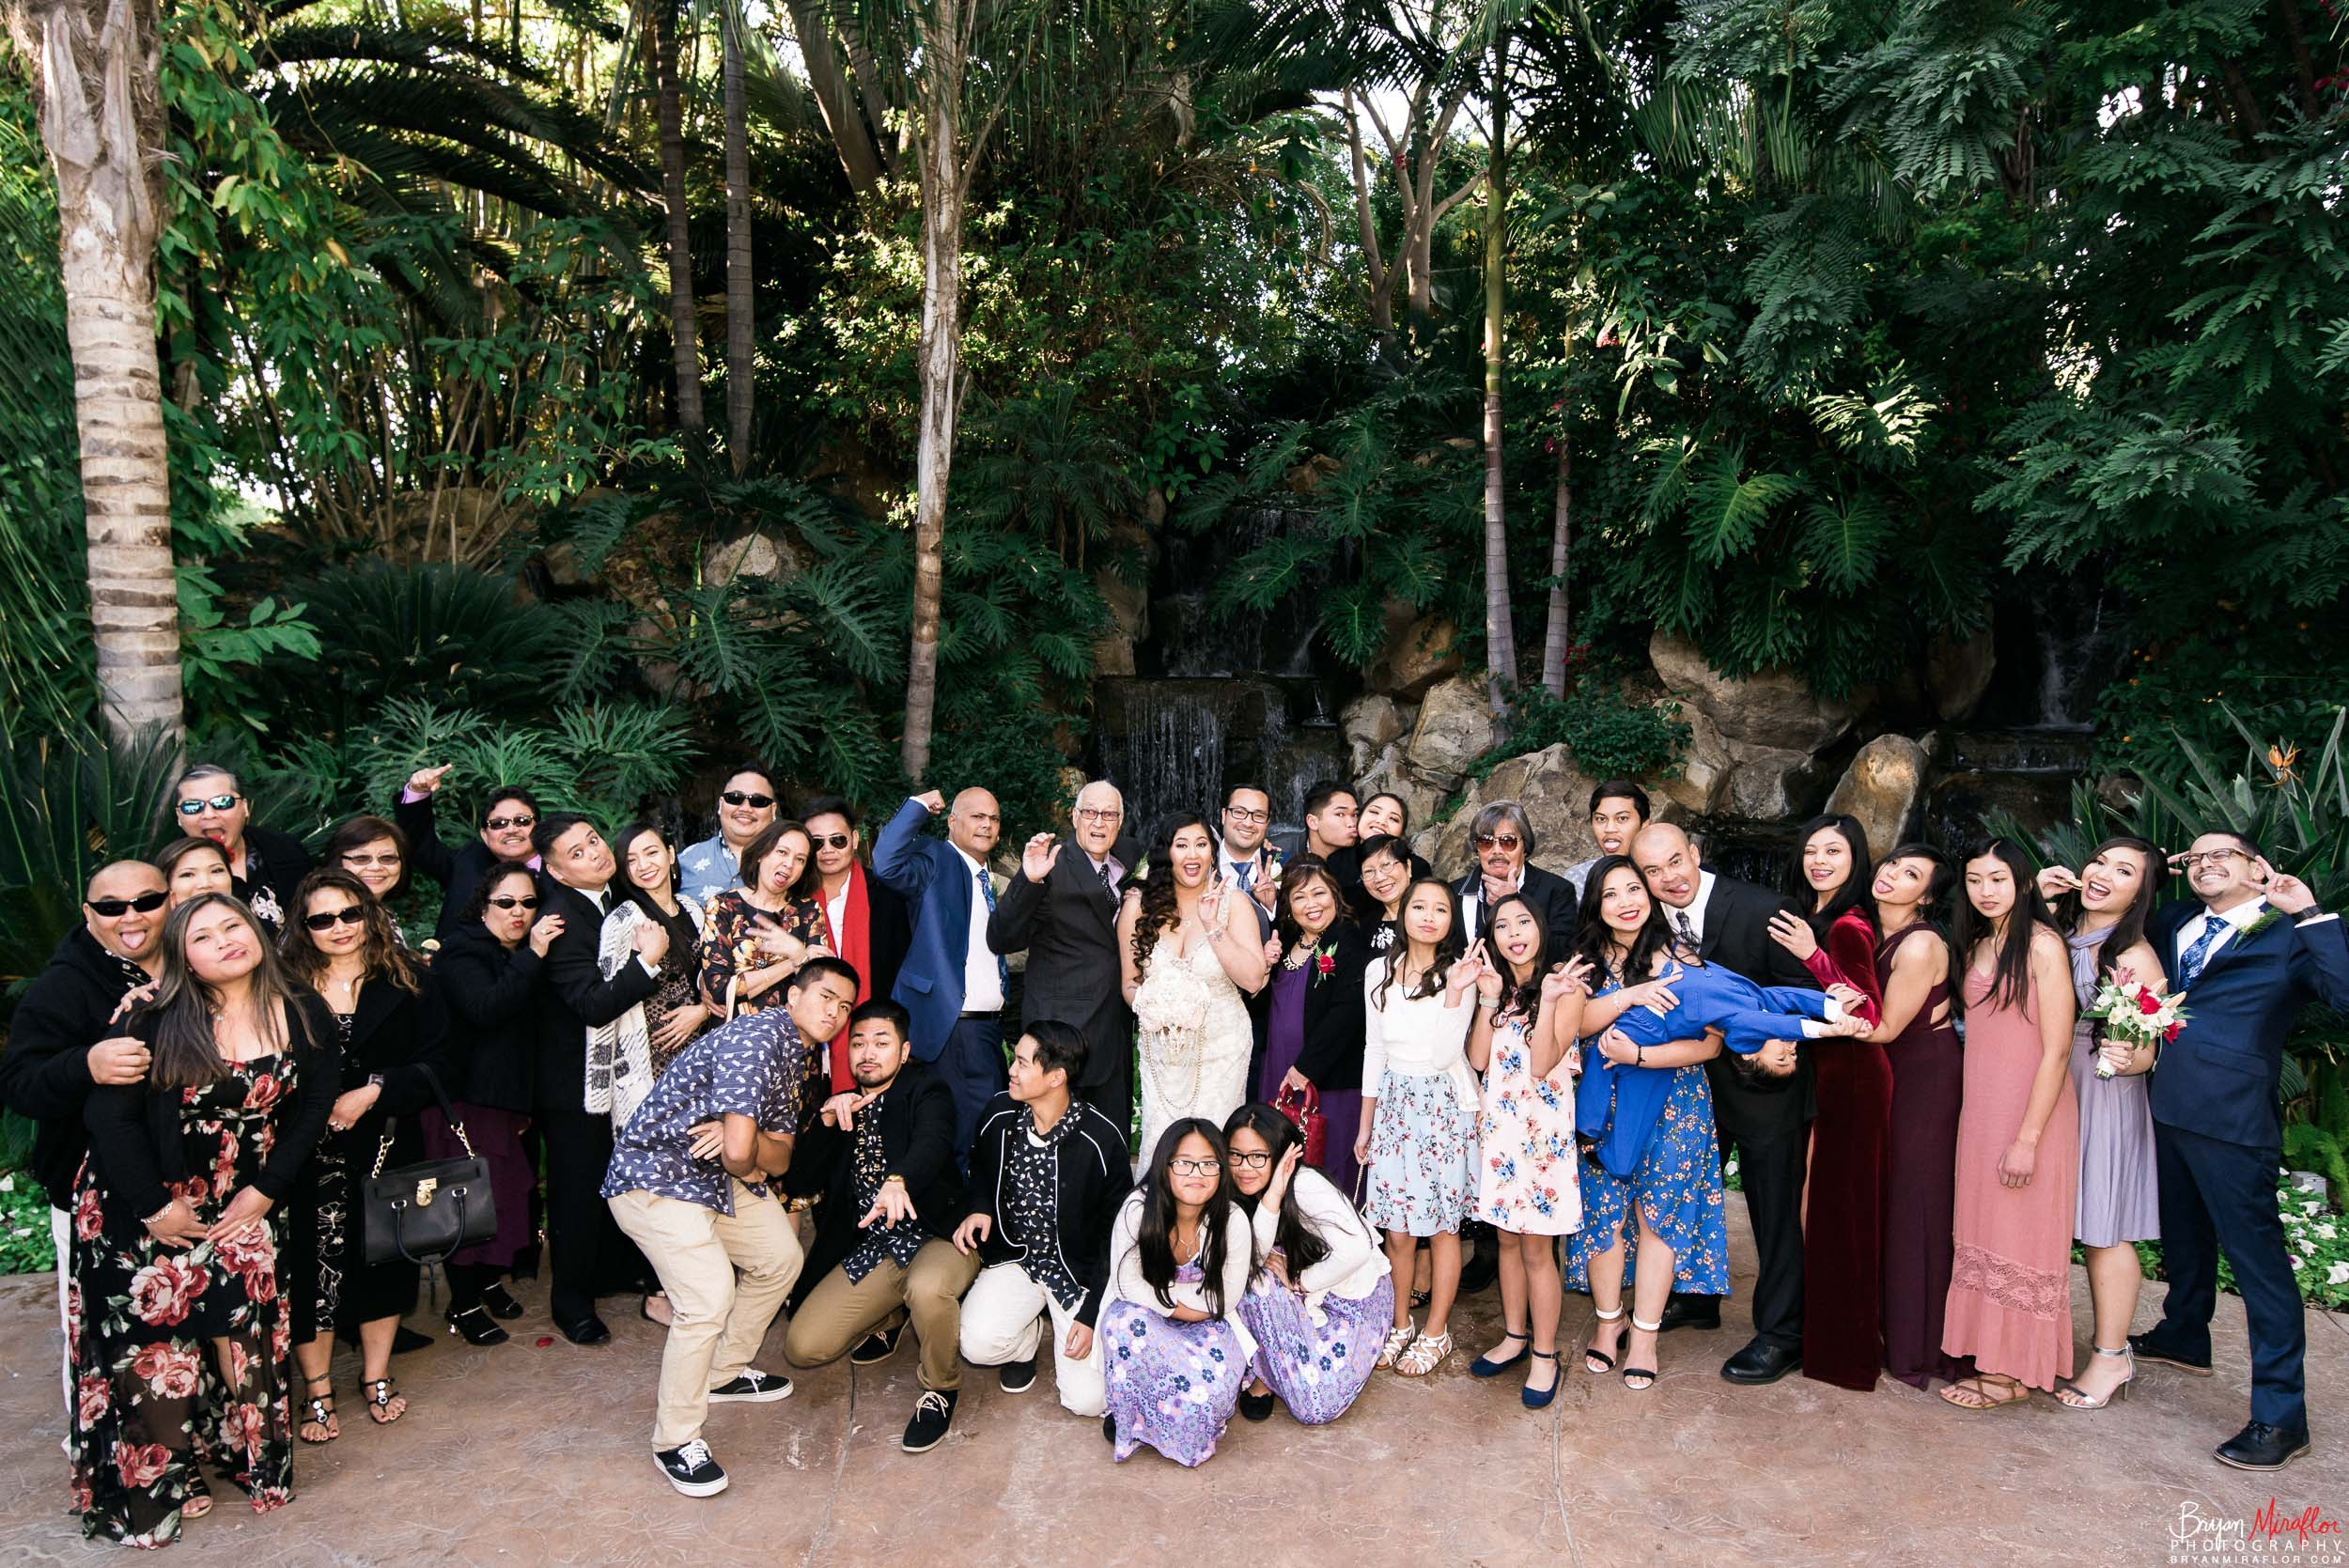 Bryan-Miraflor-Photography-Hannah-Jonathan-Married-Grand-Traditions-Estate-Gardens-Fallbrook-20171222-147.jpg